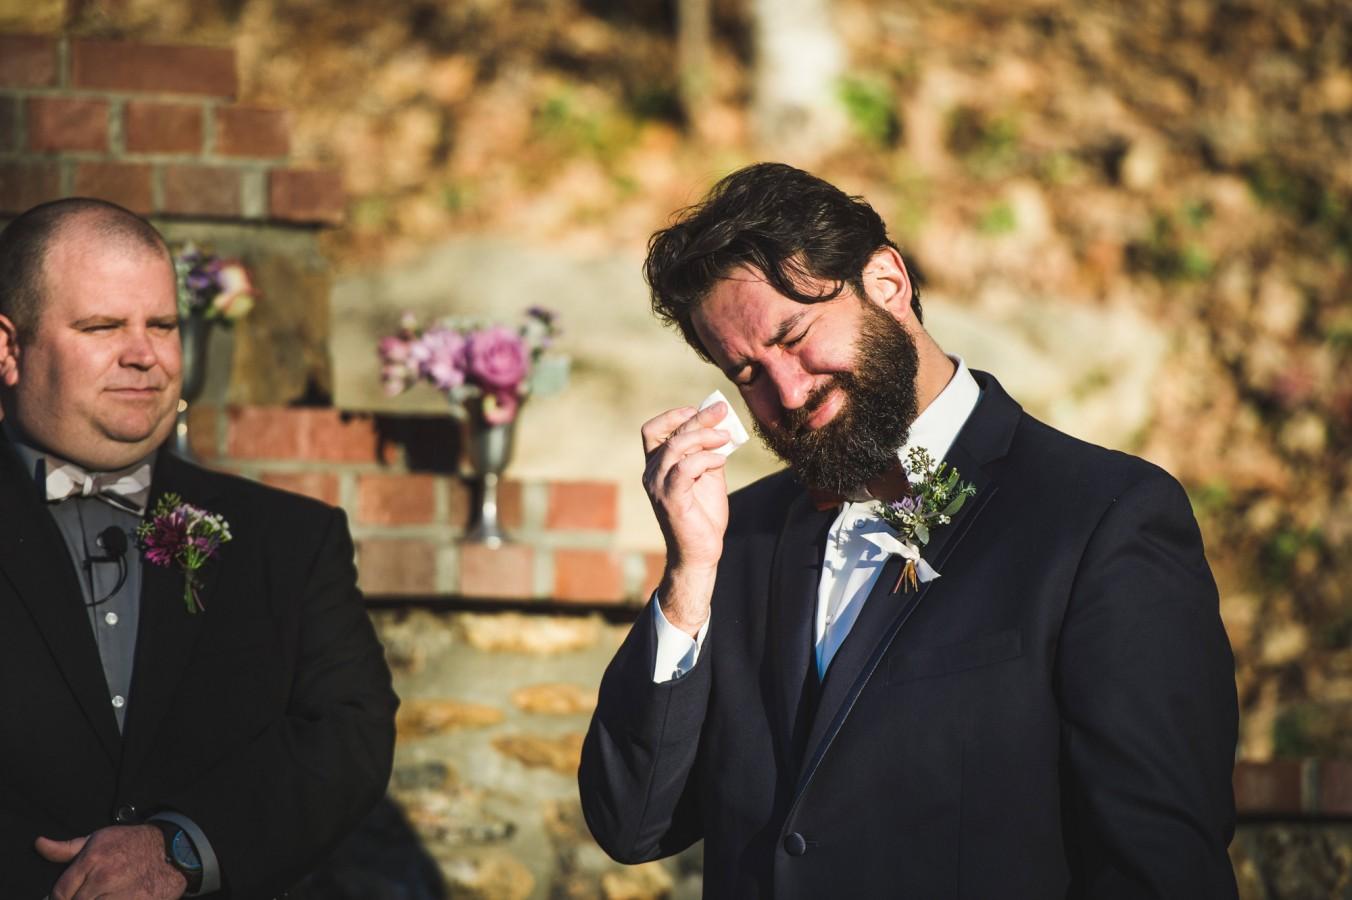 fete-photography-weddings-029